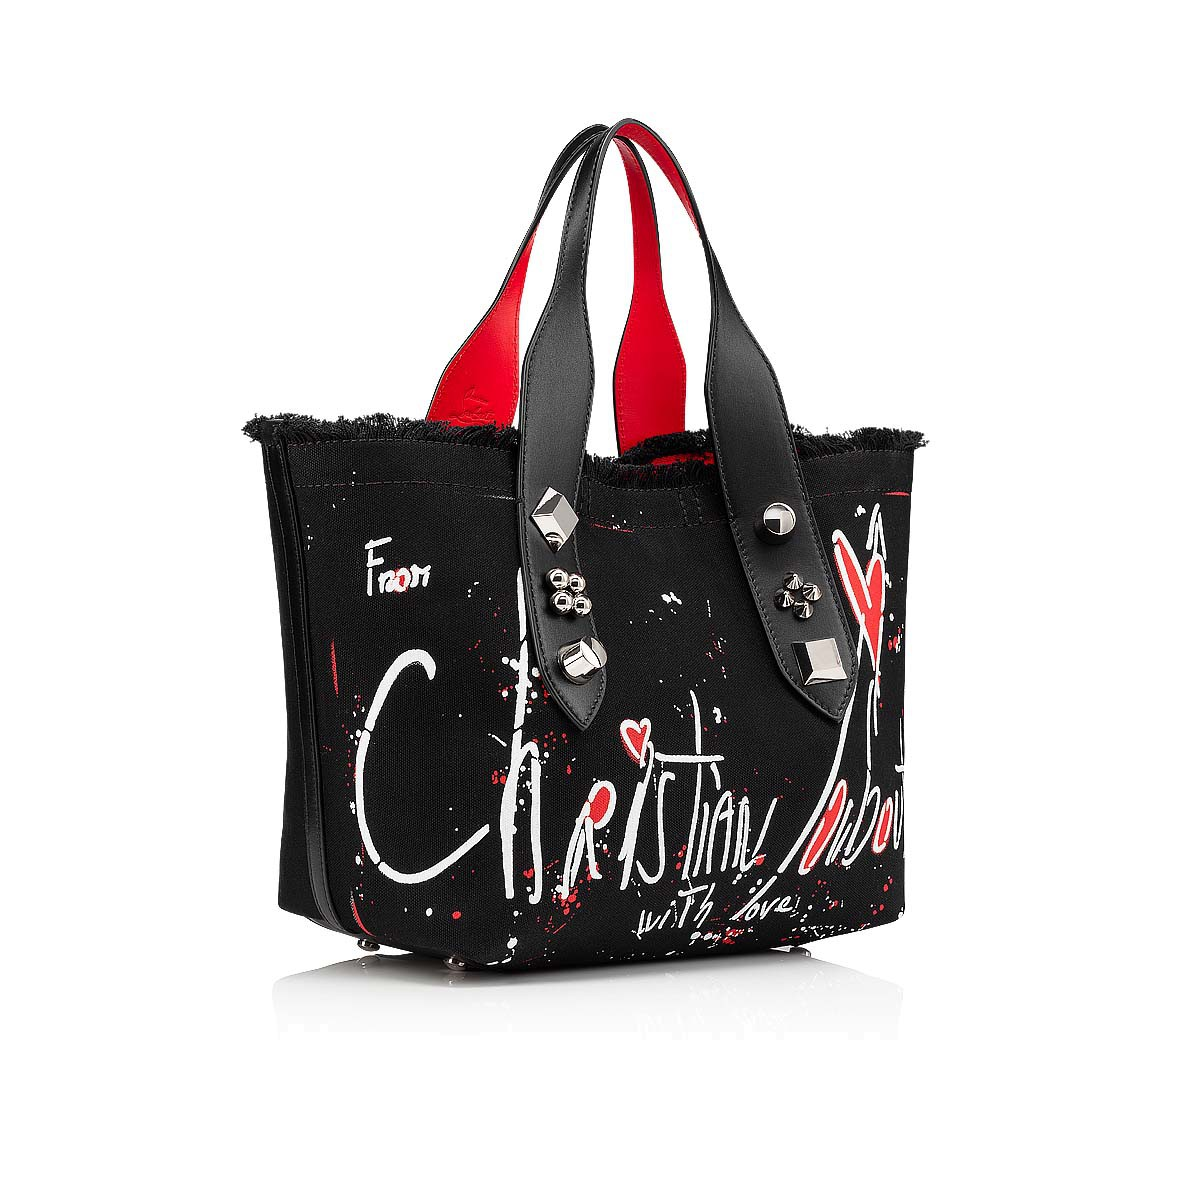 Bags - Frangibus - Christian Louboutin